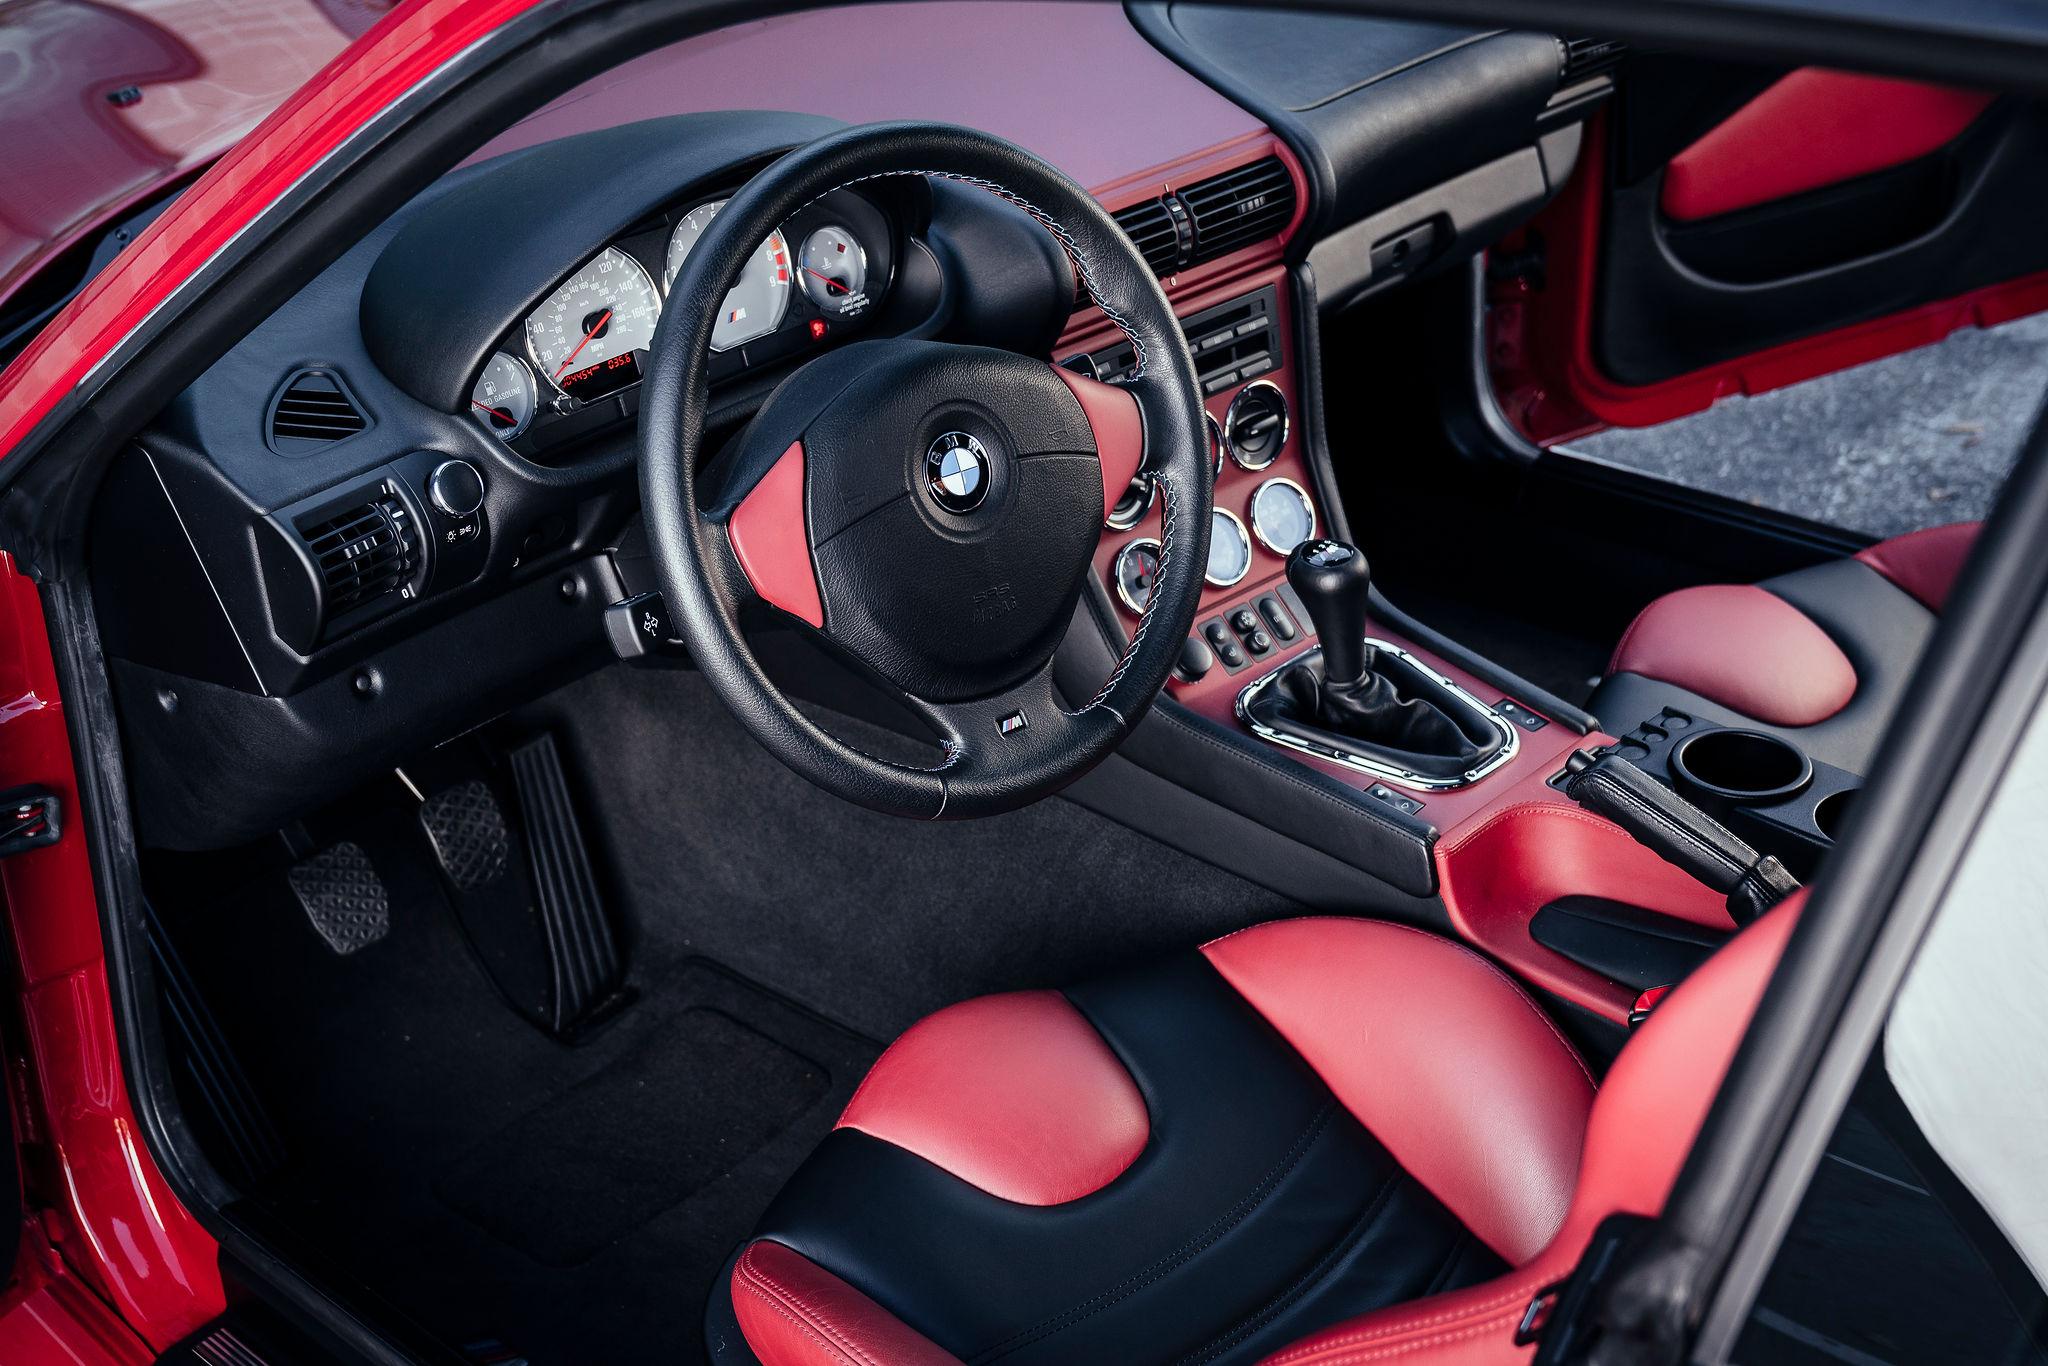 2002 BMW Z3 M Coupe interior driver